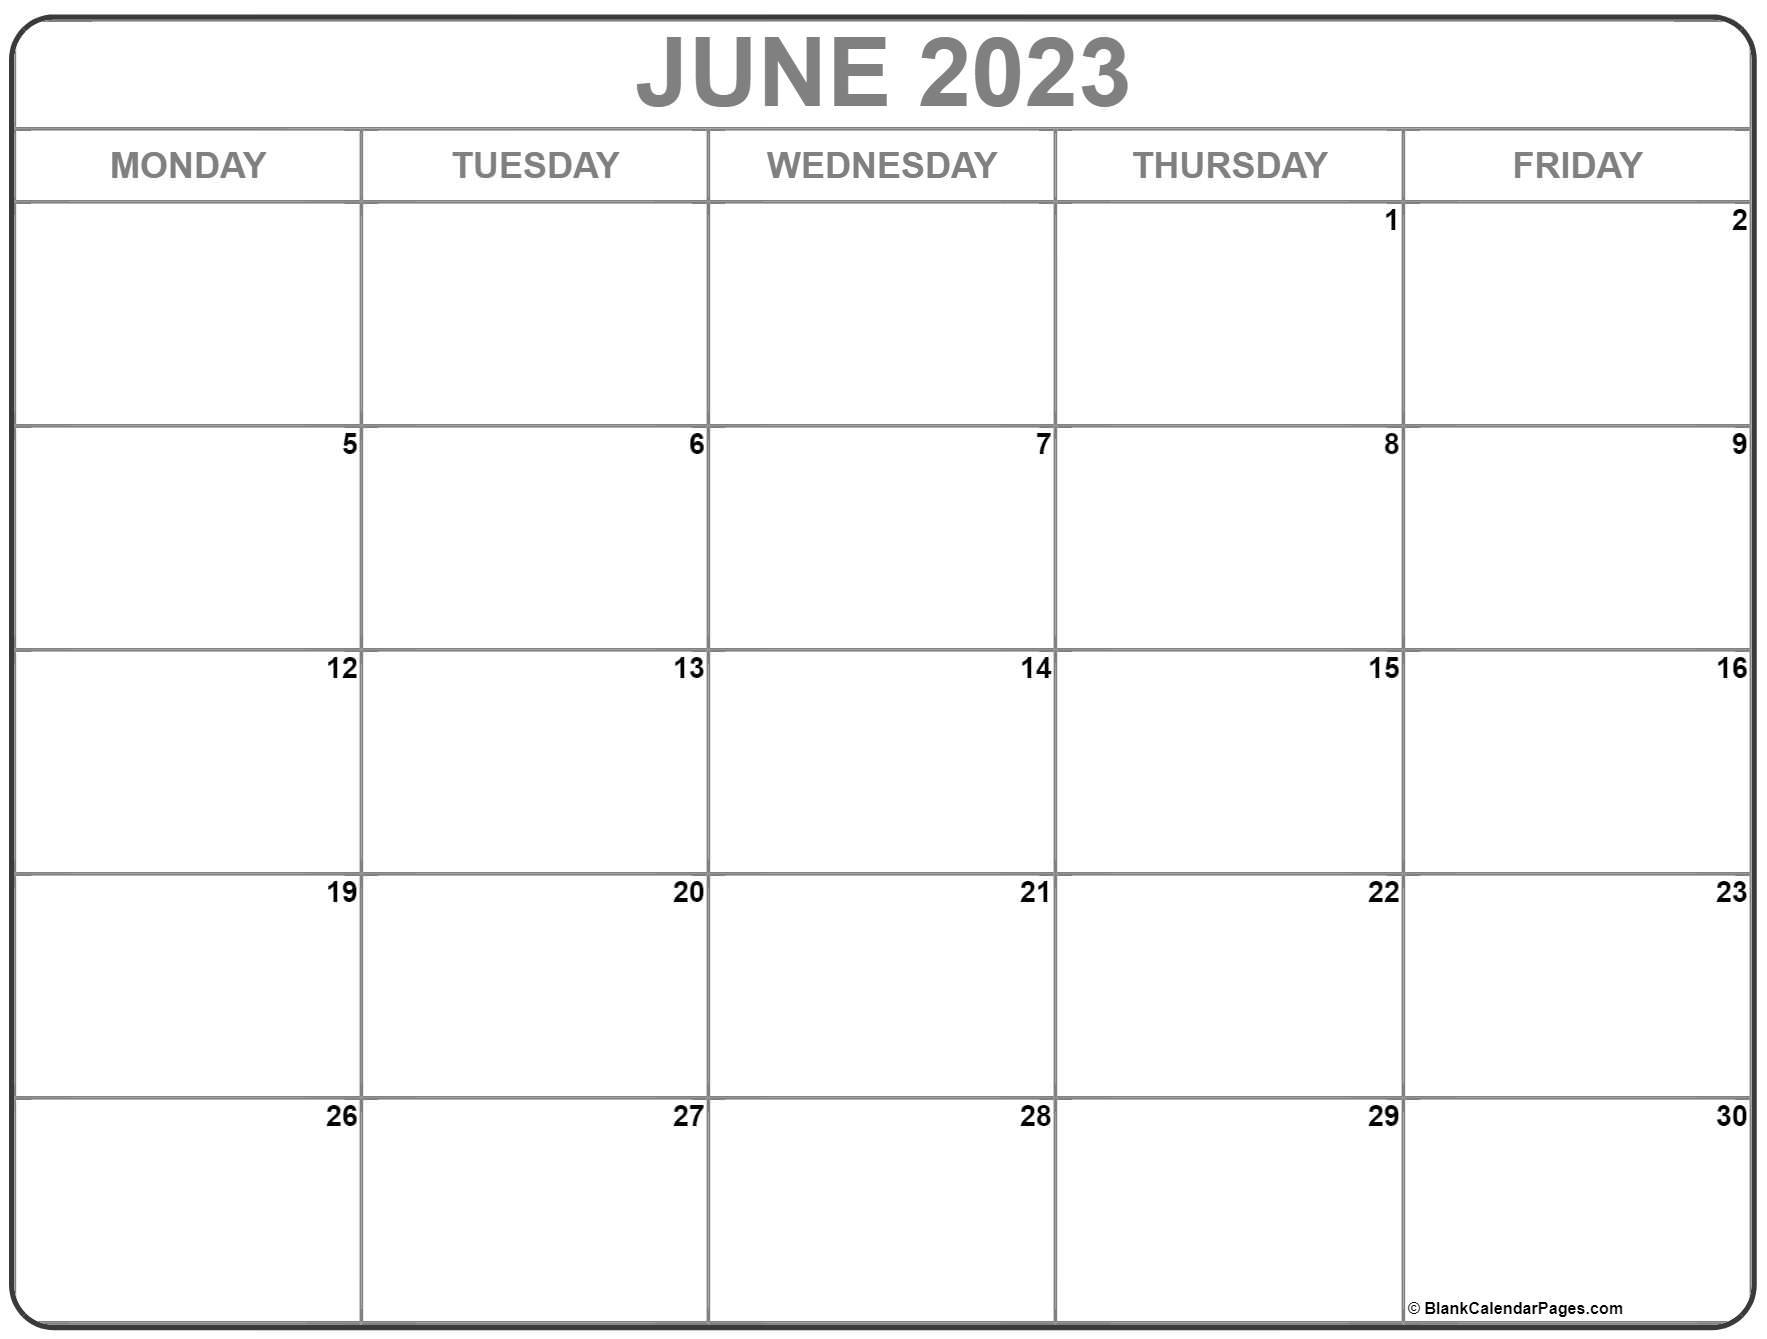 June 2023 Monday Calendar | Monday To Sunday